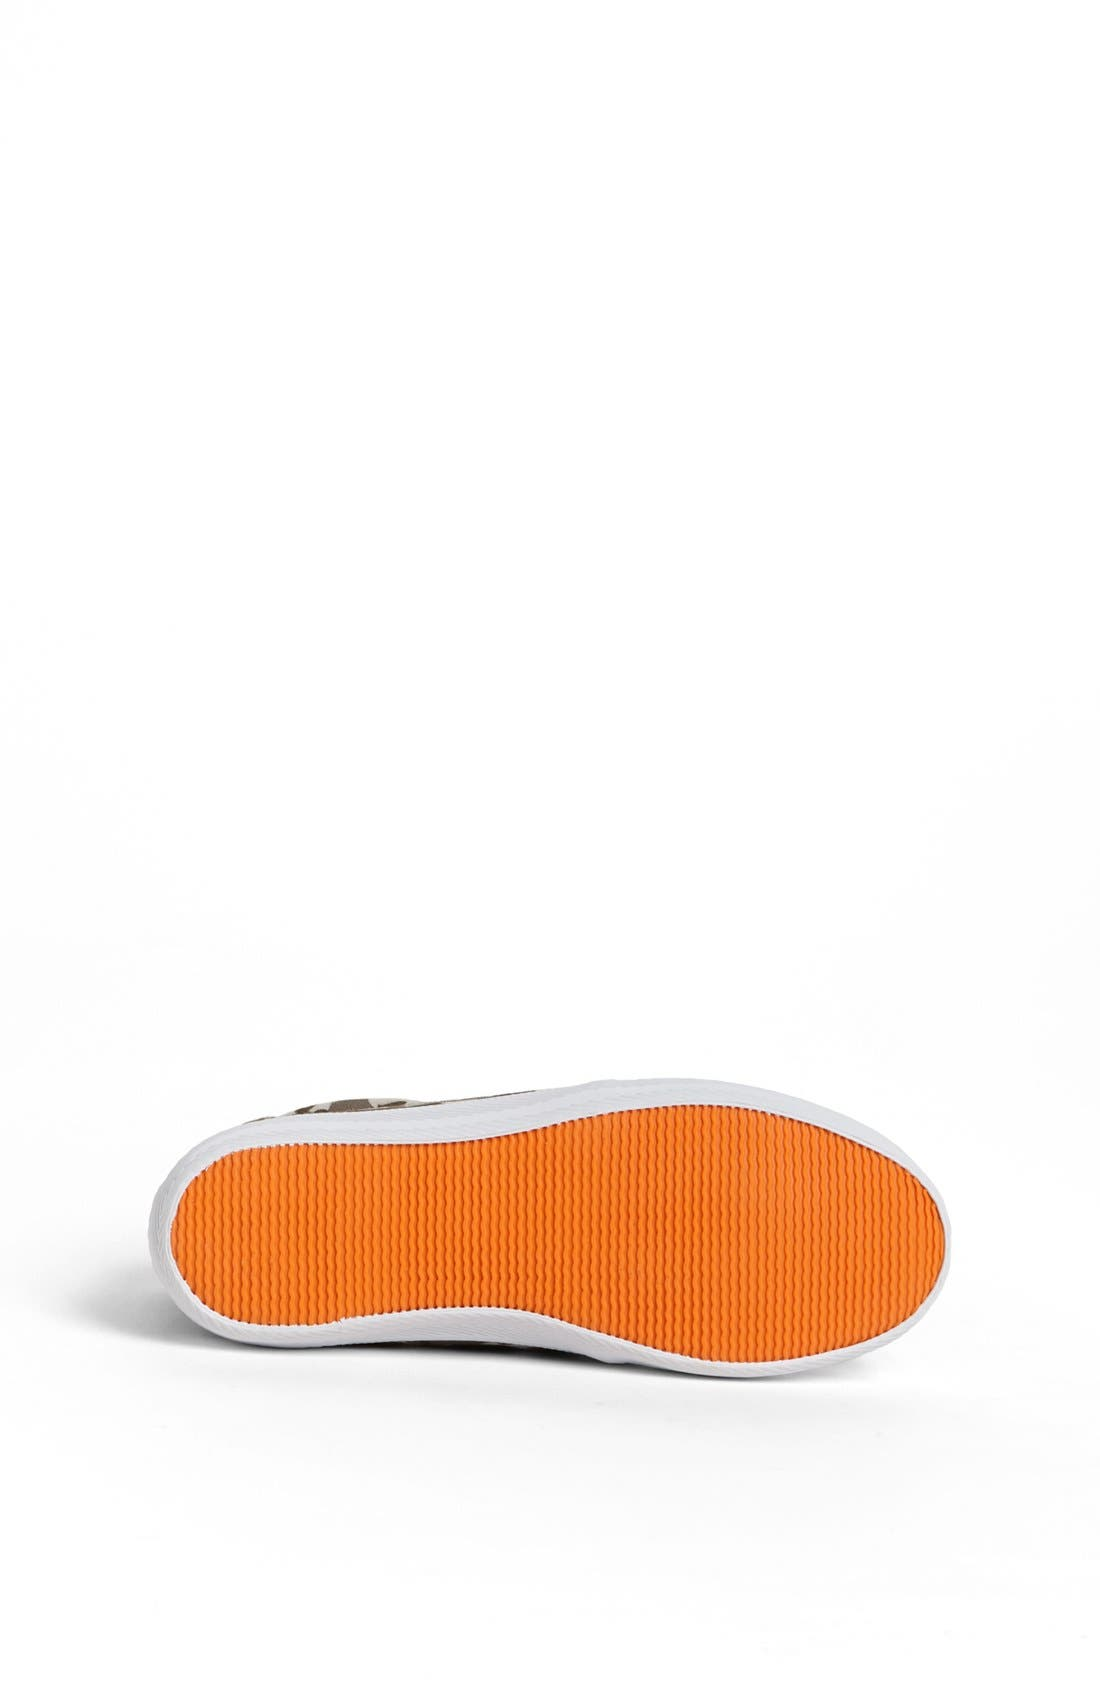 Alternate Image 4  - Lacoste 'Ampthill' Sneaker (Baby, Walker, Toddler, Little Kid & Big Kid)